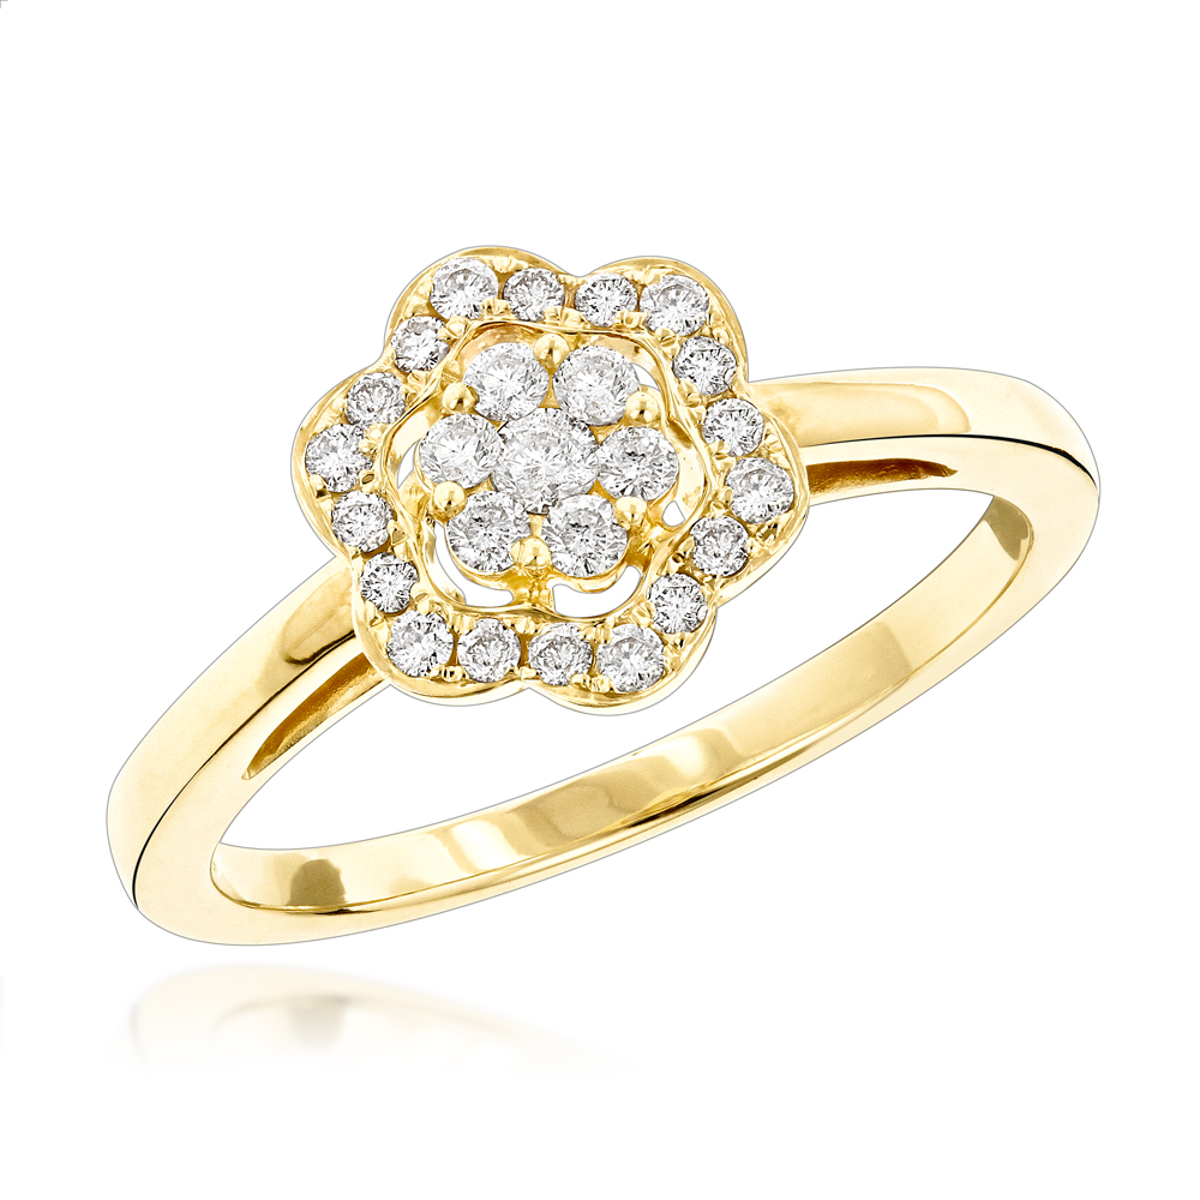 Flower Diamond Rings: 14K Gold Ladies Diamond Cluster Ring 0.4 ct